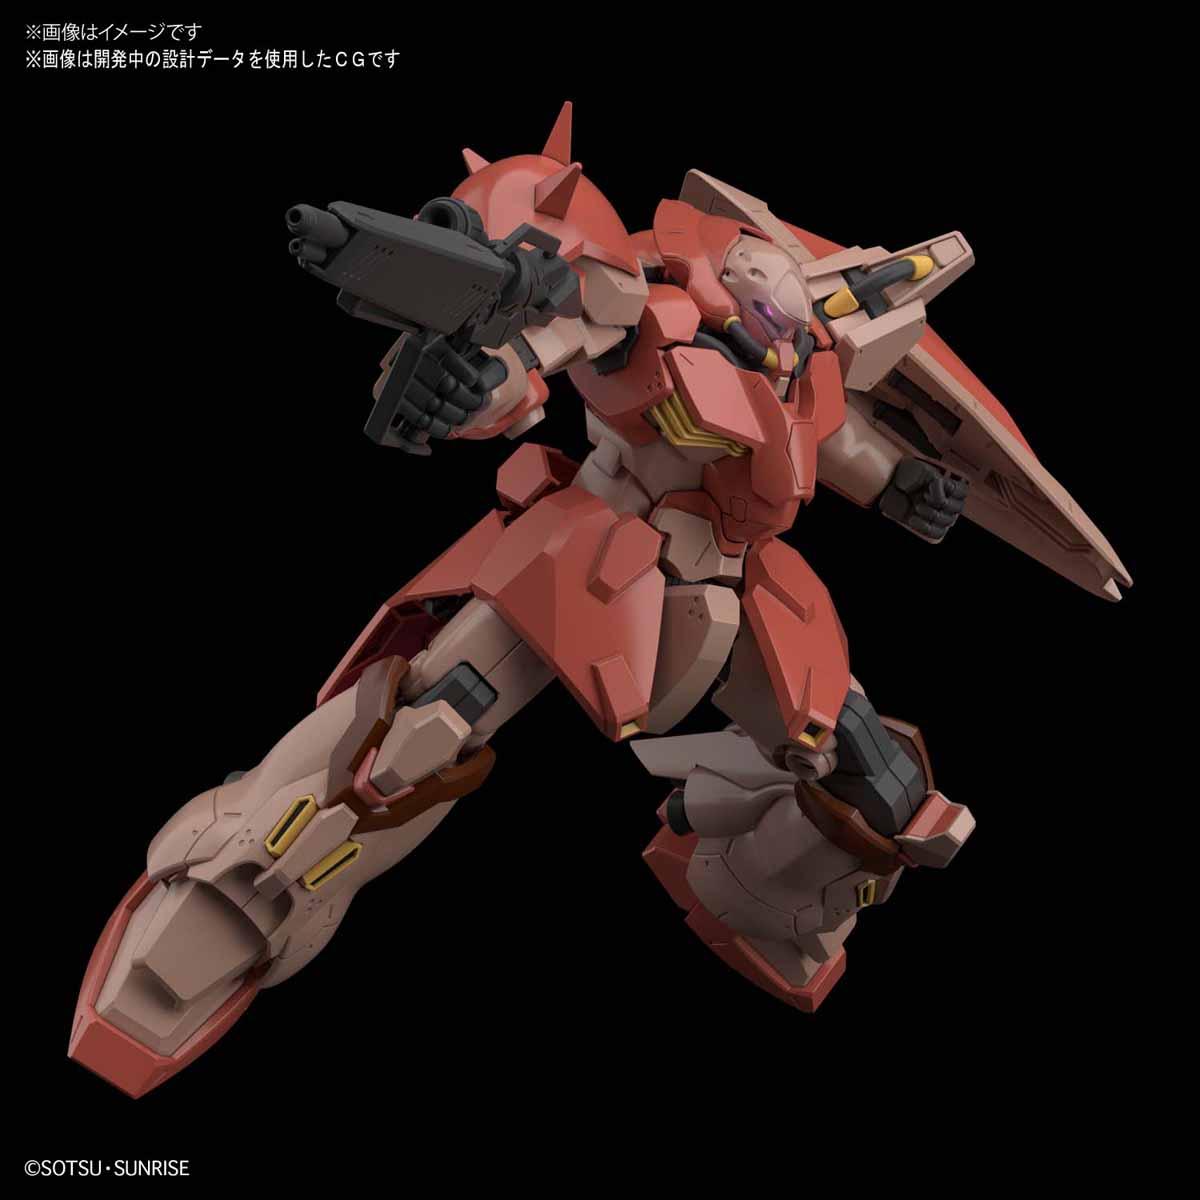 HGUC 1/144『メッサー(仮)』機動戦士ガンダム 閃光のハサウェイ プラモデル-001